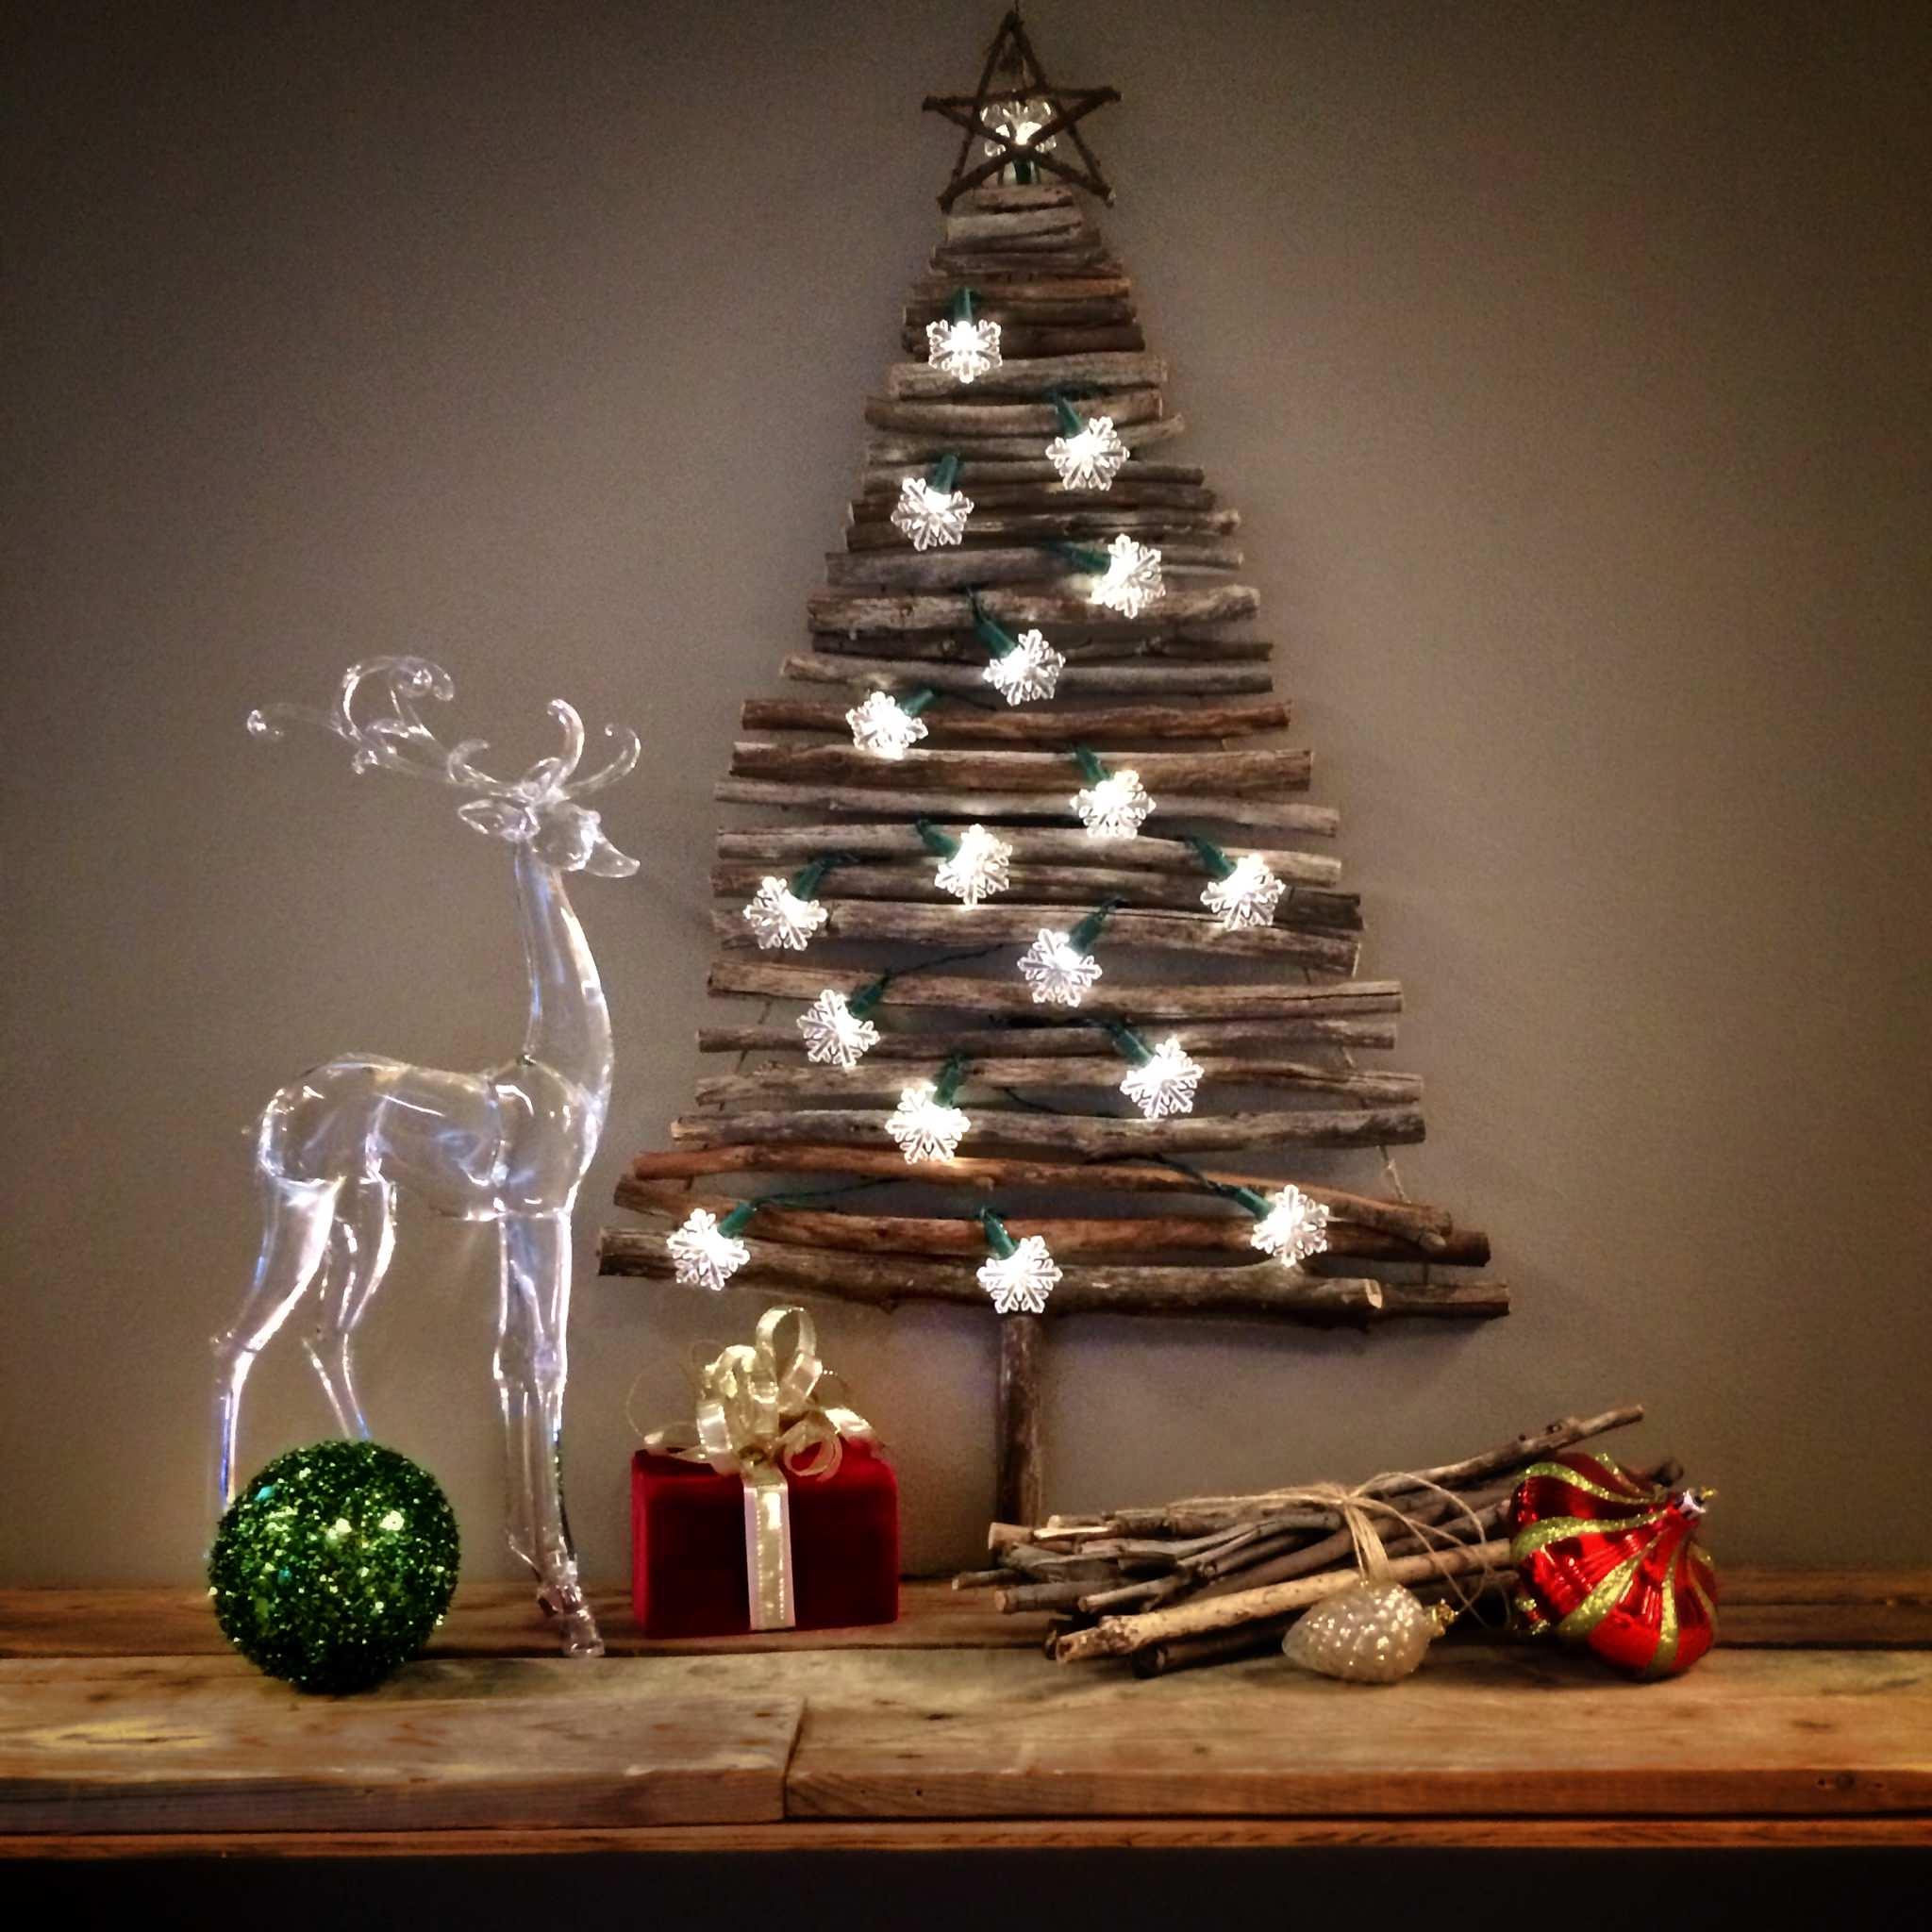 christmas tree decorations - HD2048×2048